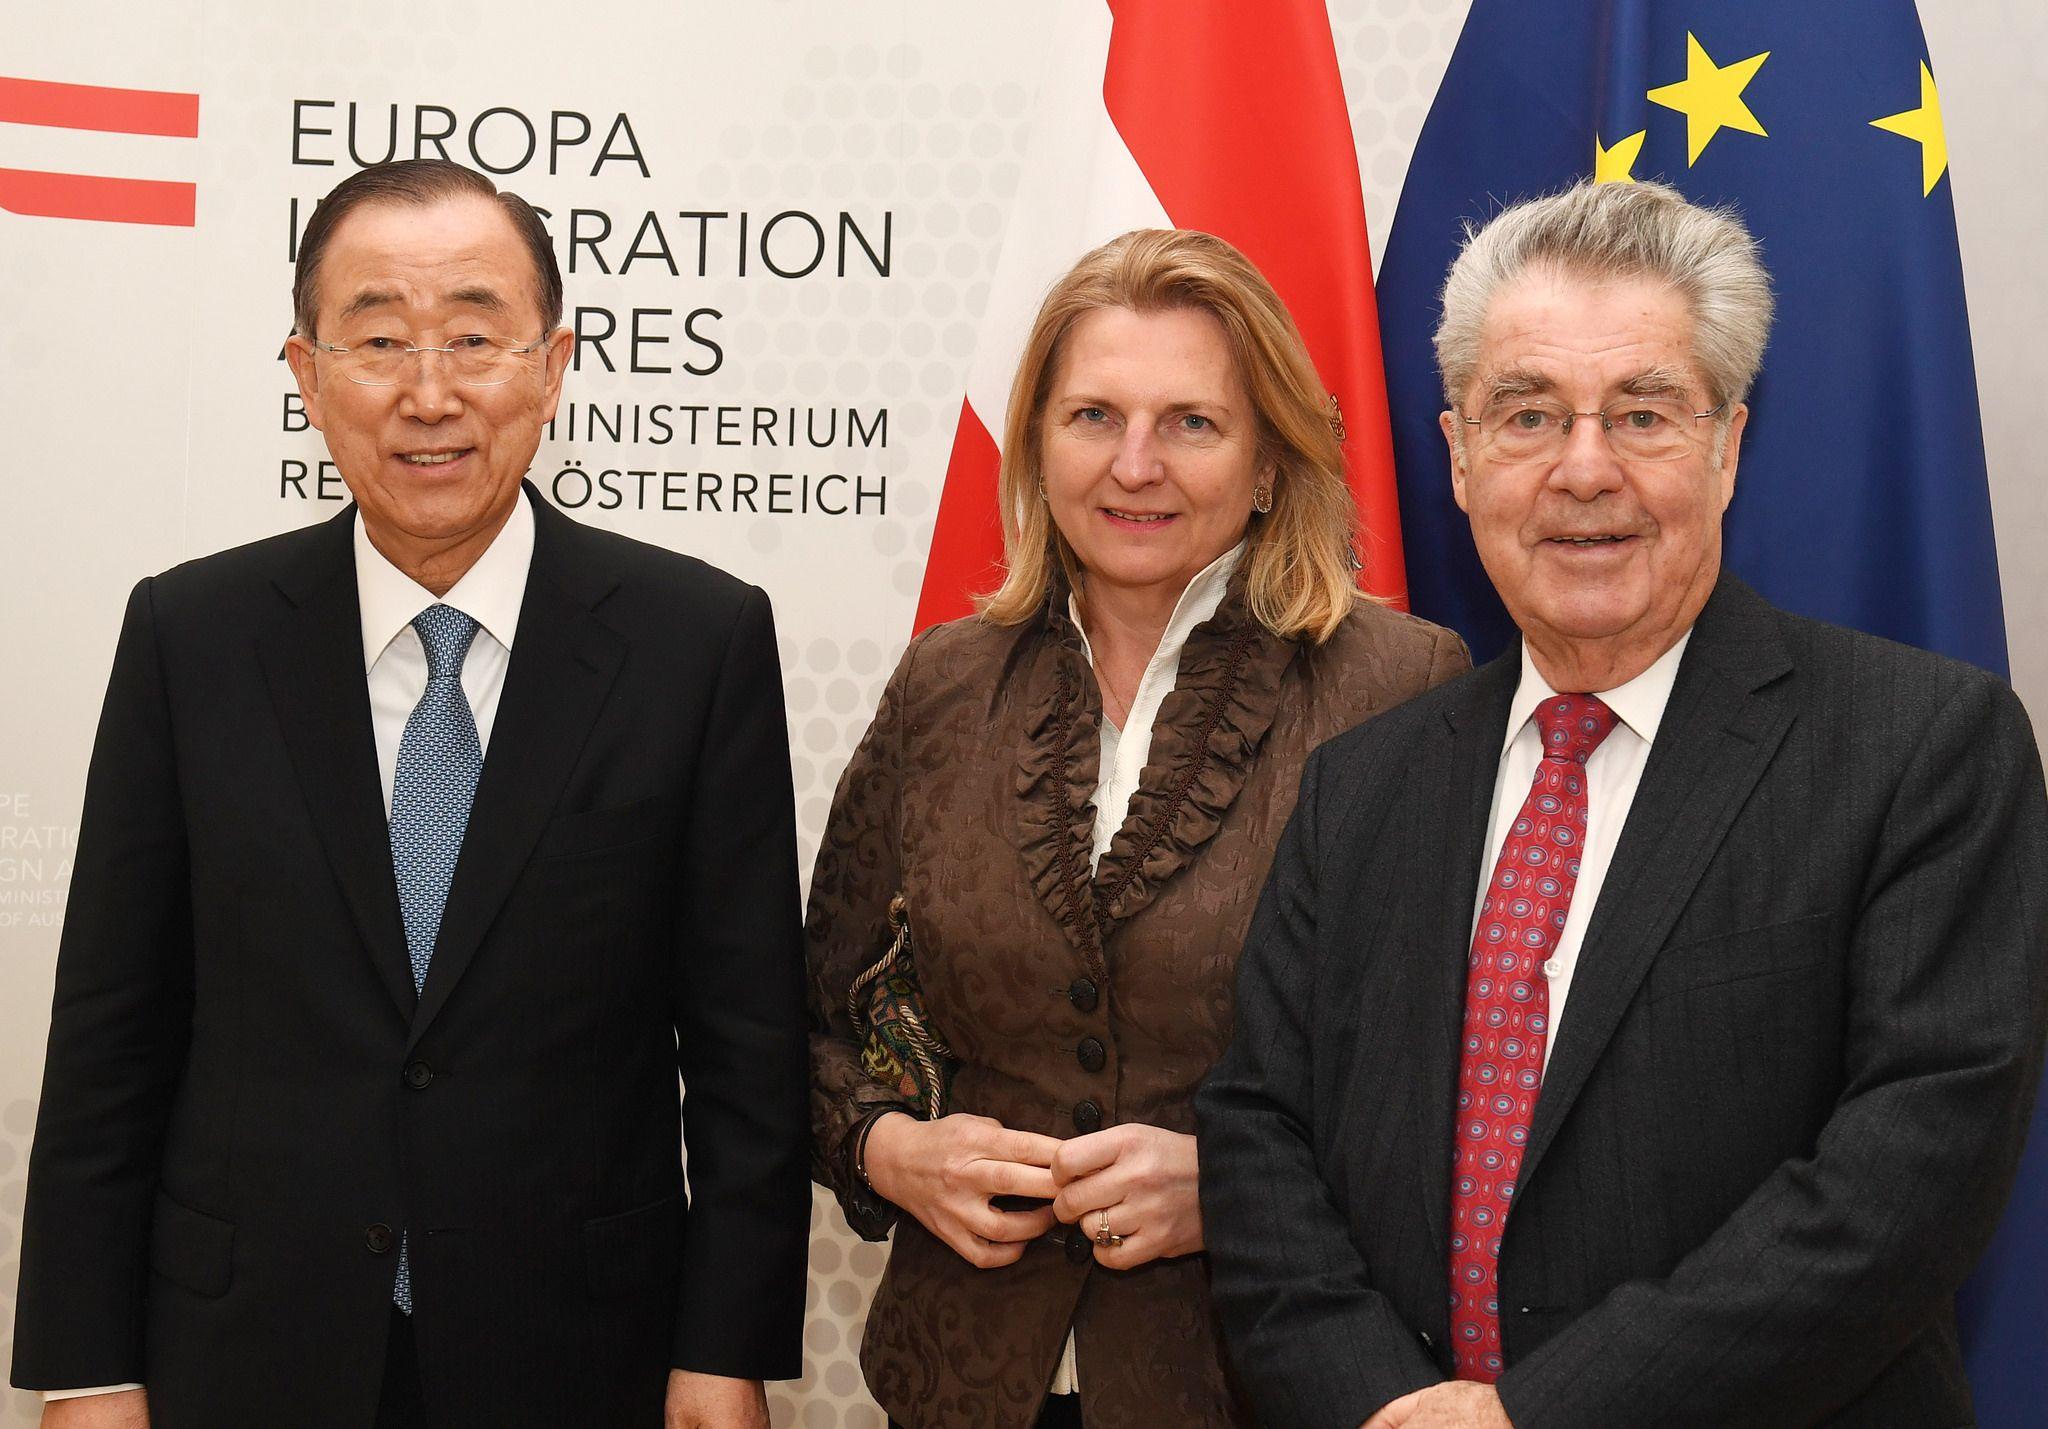 Aussenministerin Kneissl Trifft Ehem Vn Gs Ban Ki Moon Sowie Altbundesprasidenten Dr Heinz Fischer Aussenminister Alter Bundchen